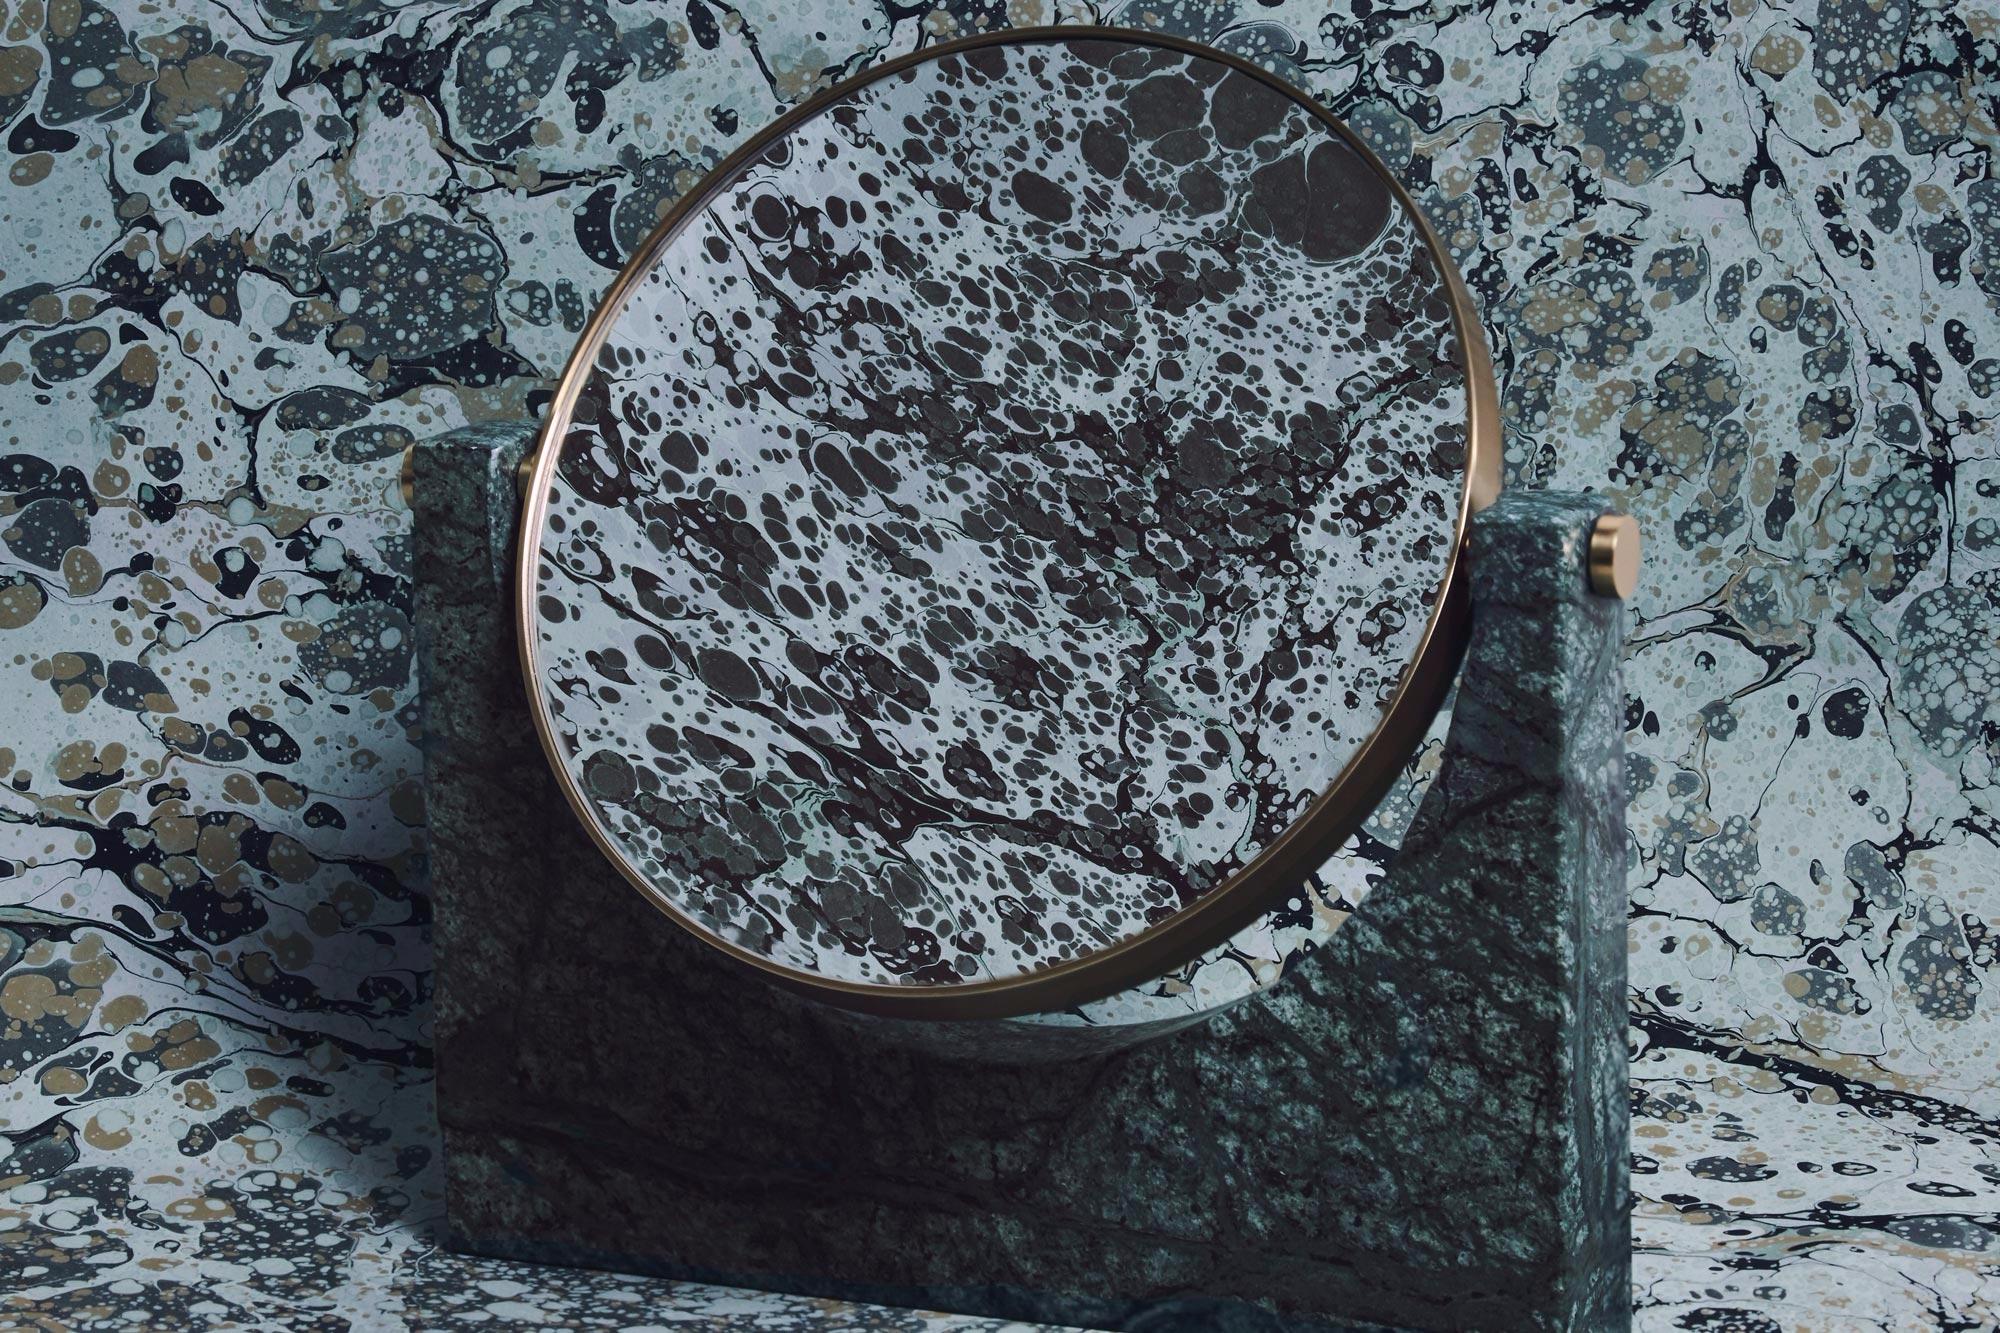 Mesmerizing Marble, 2016 - marta_panda | ello